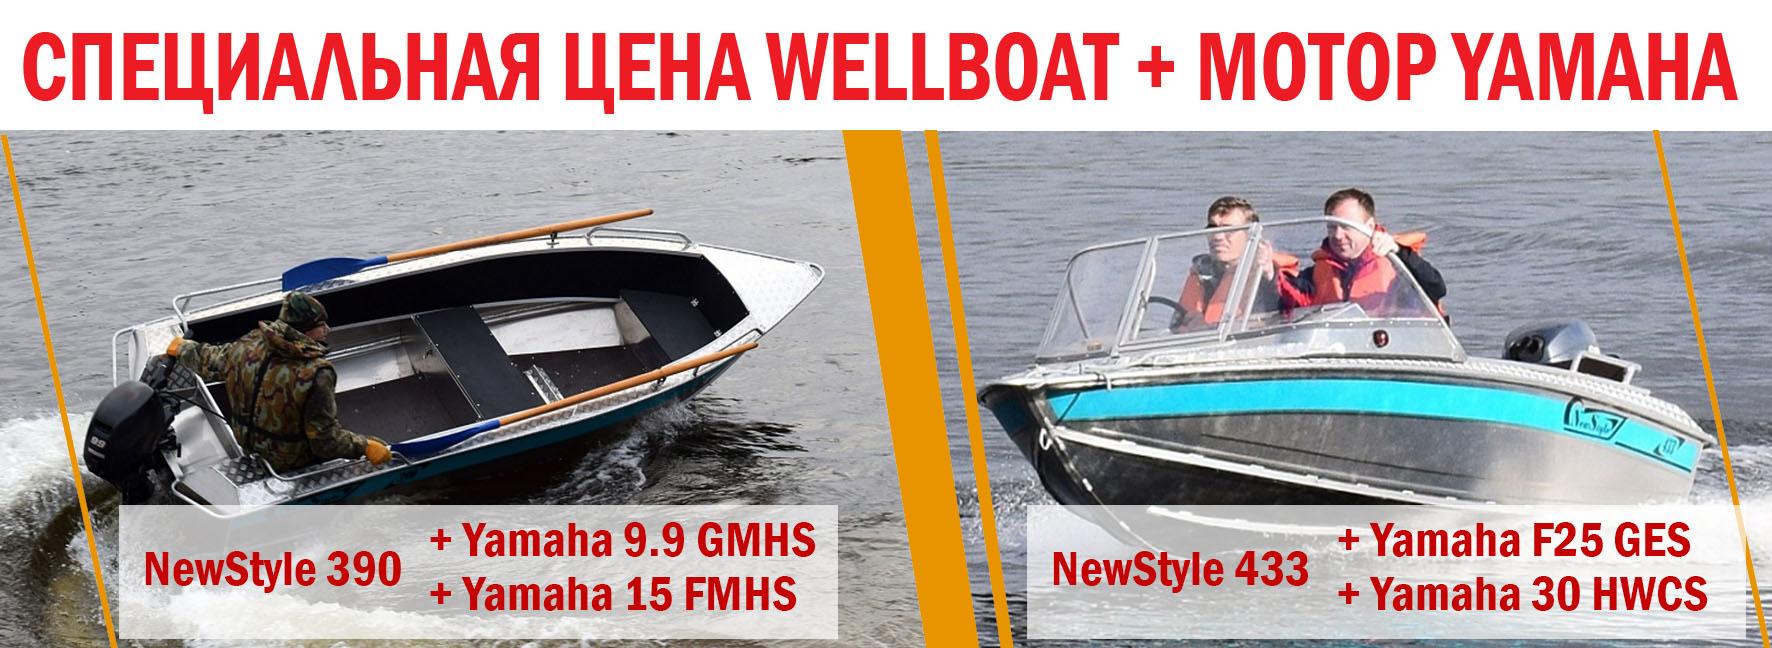 wellboat-motor